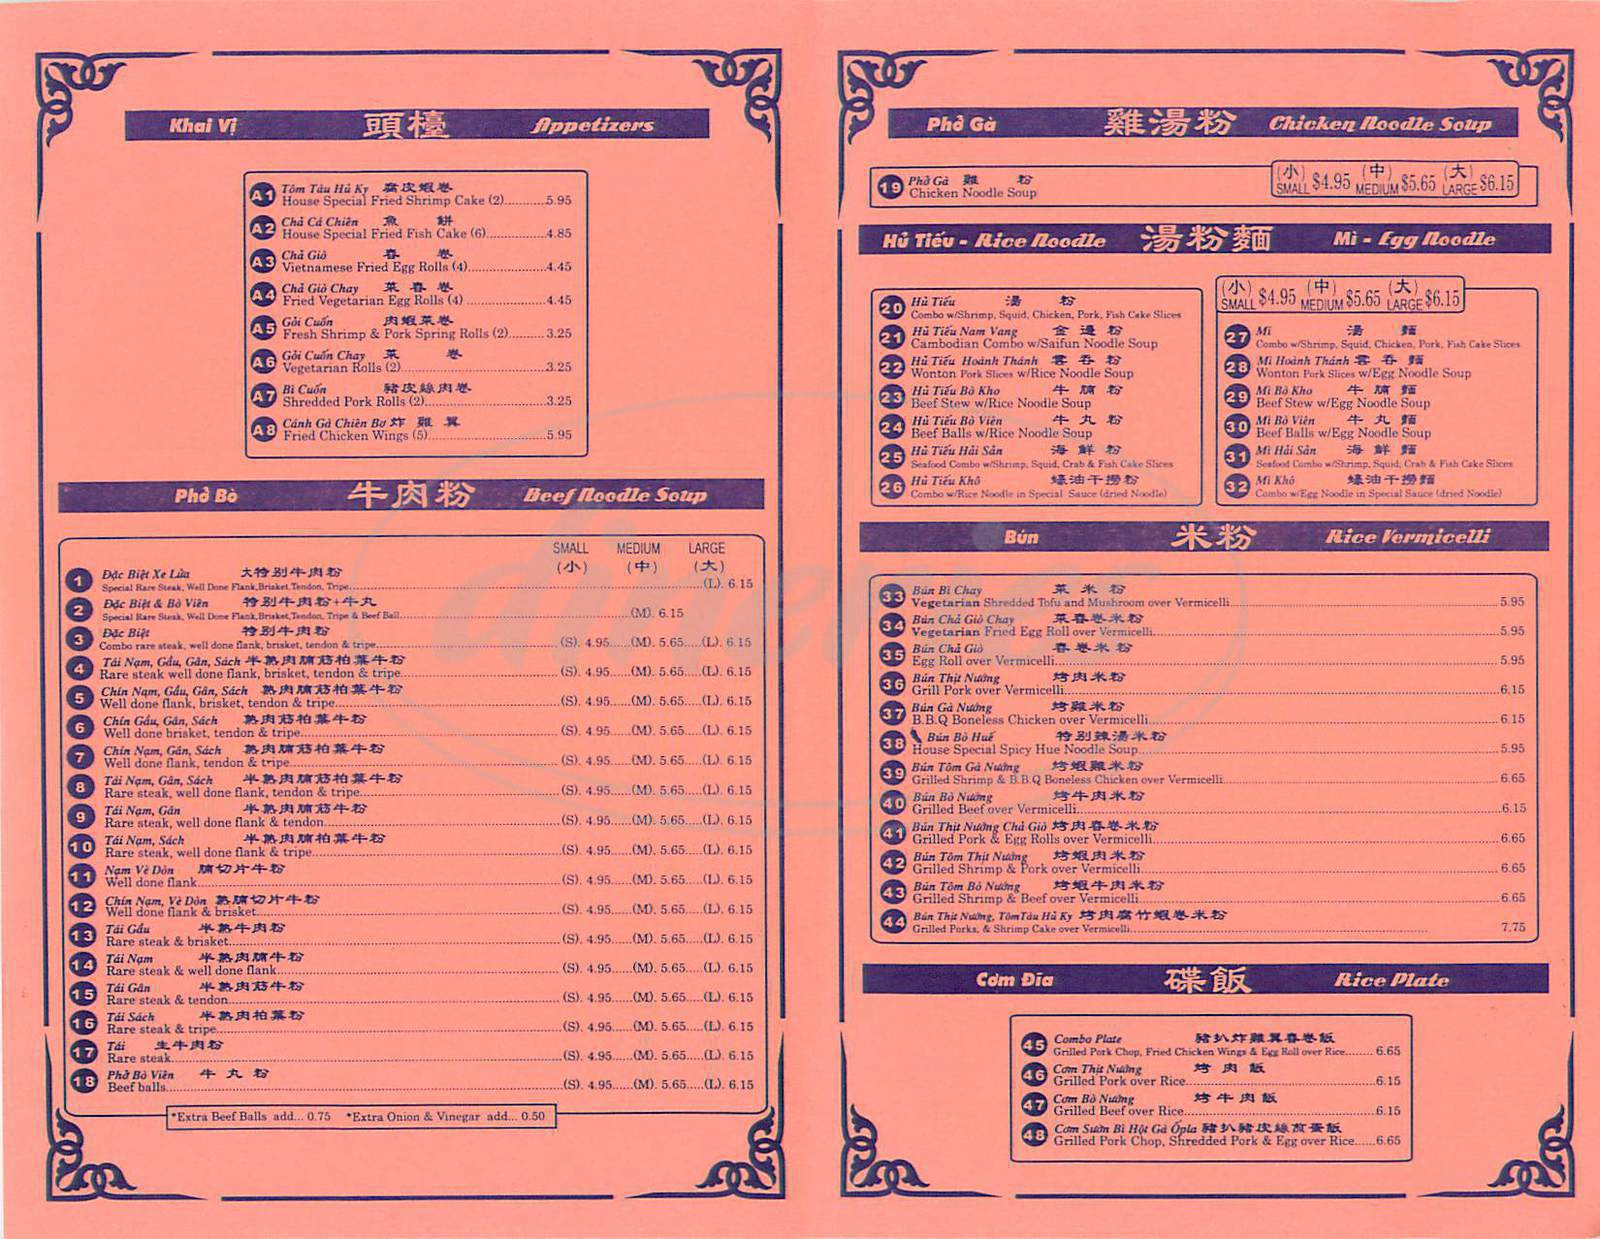 menu for Pho Pasteur